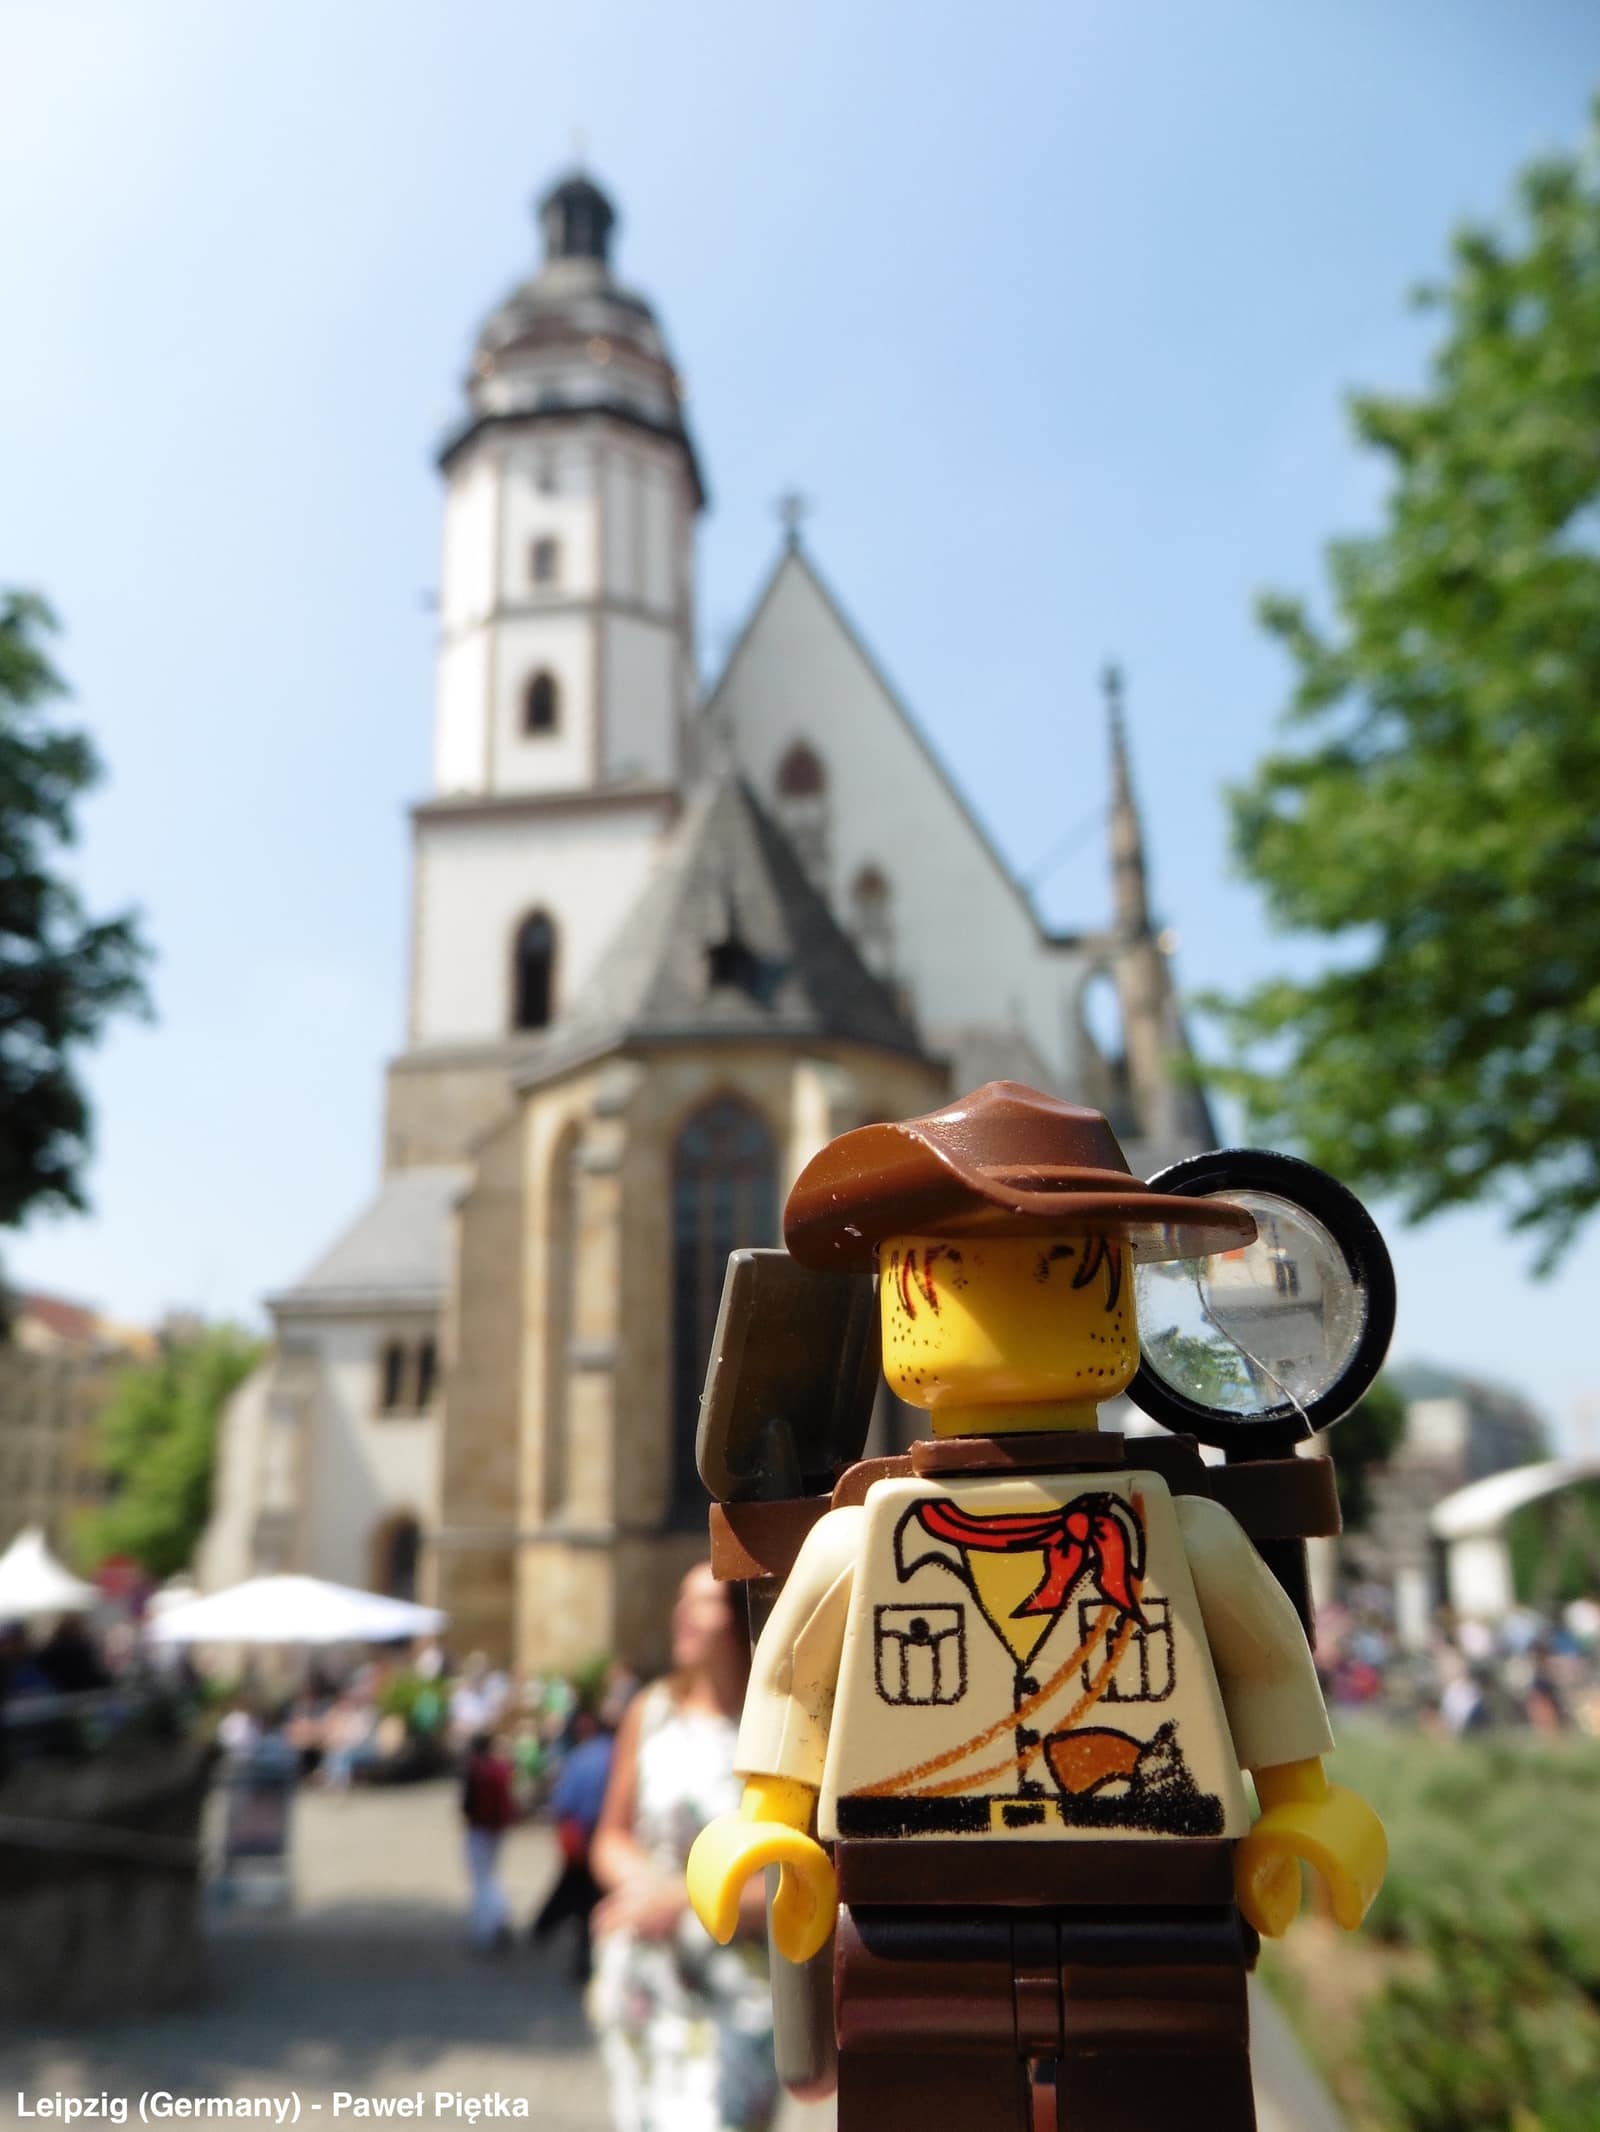 Leipzig (Germany) - St Thomas Church